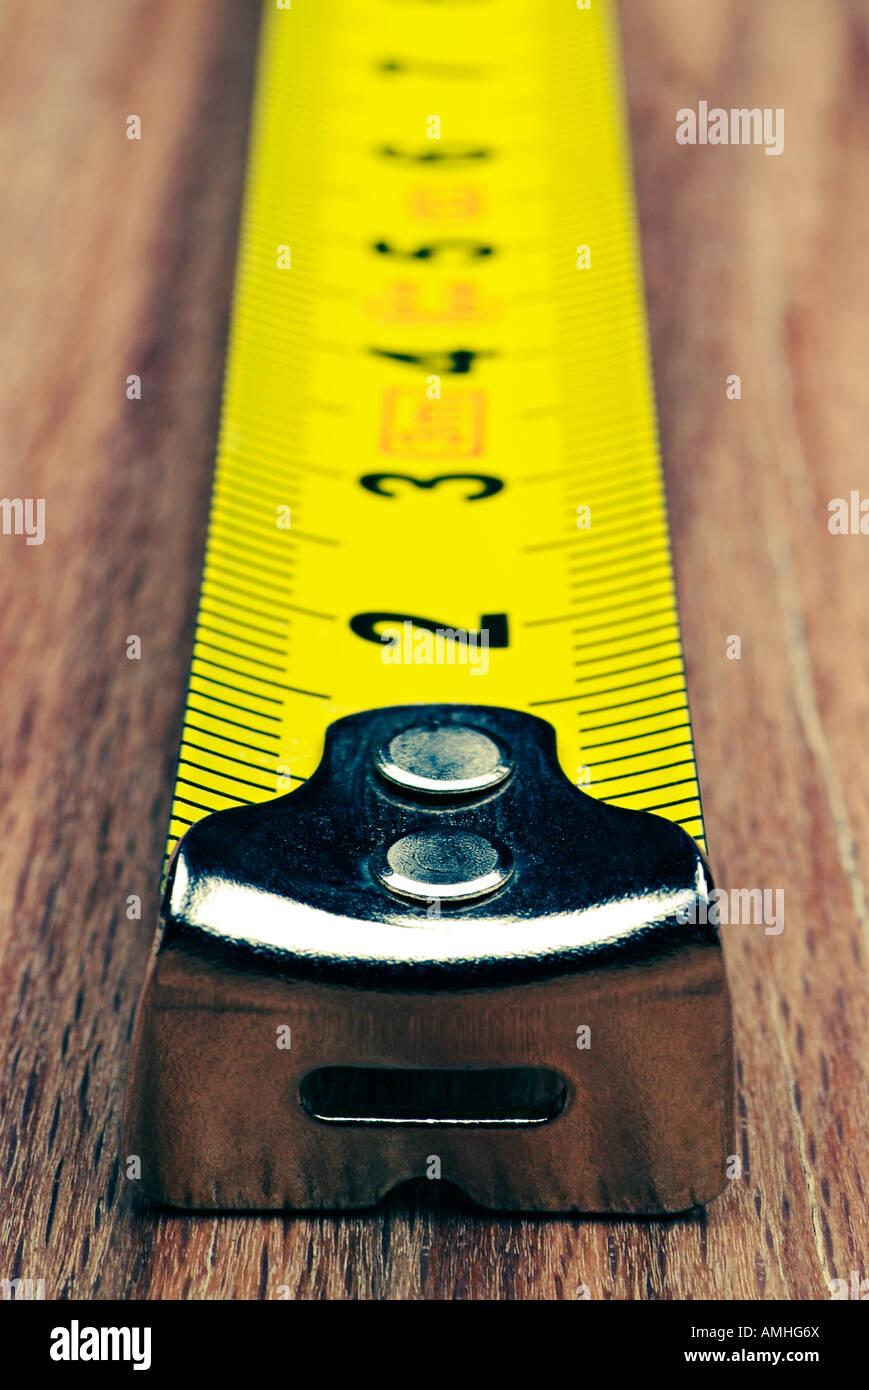 Tape Measure Close Up - Stock Image